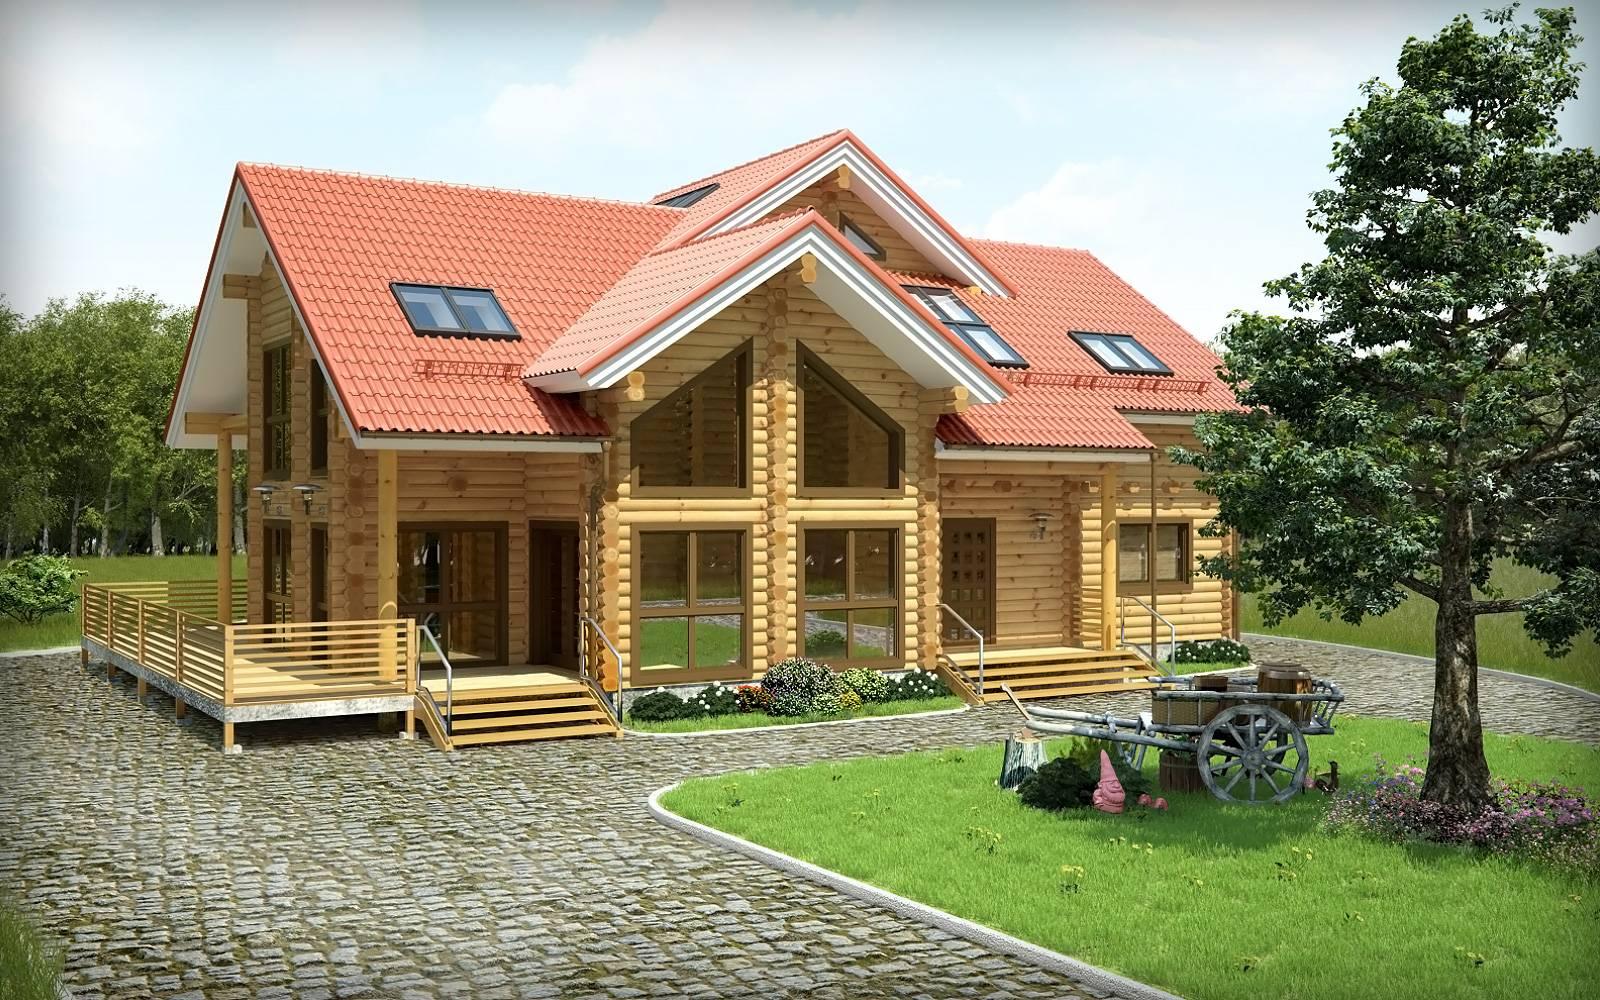 Surprising Top 16 Photos Ideas For Wood House Plans House Plans 30686 Largest Home Design Picture Inspirations Pitcheantrous